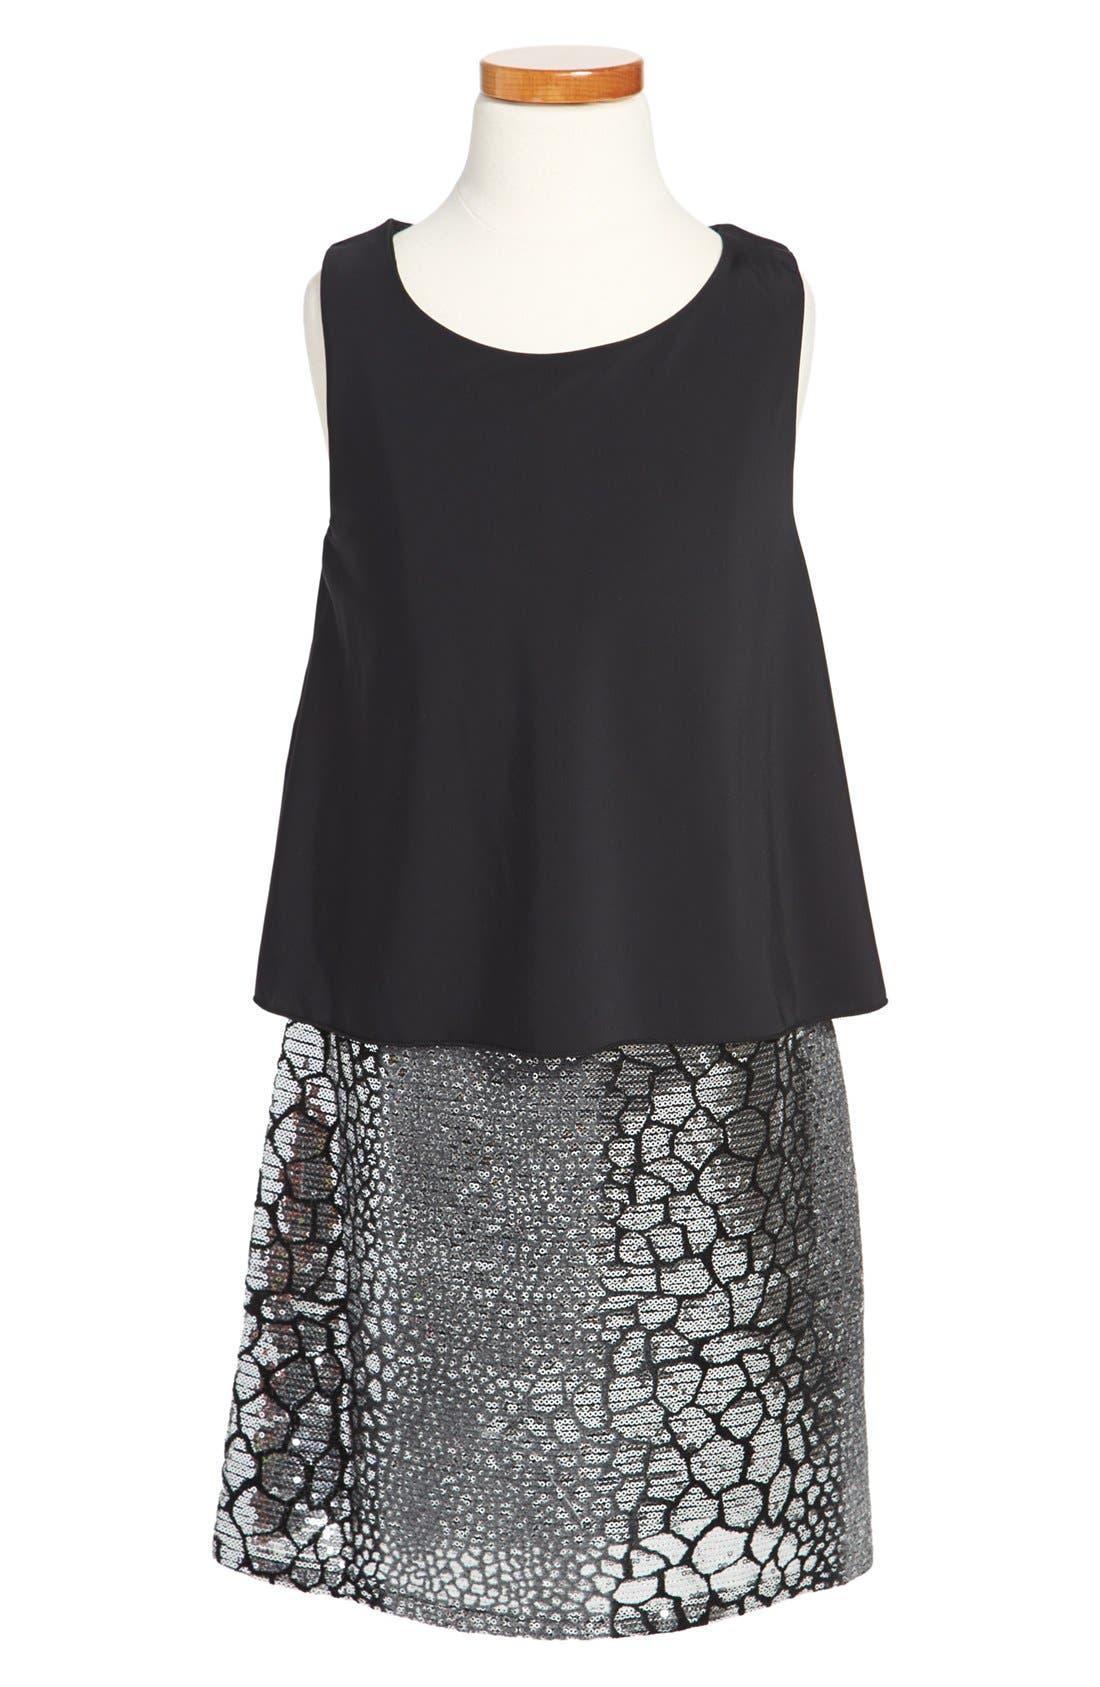 Alternate Image 1 Selected - Laundry by Shelli Segal Sleeveless Dress (Big Girls)